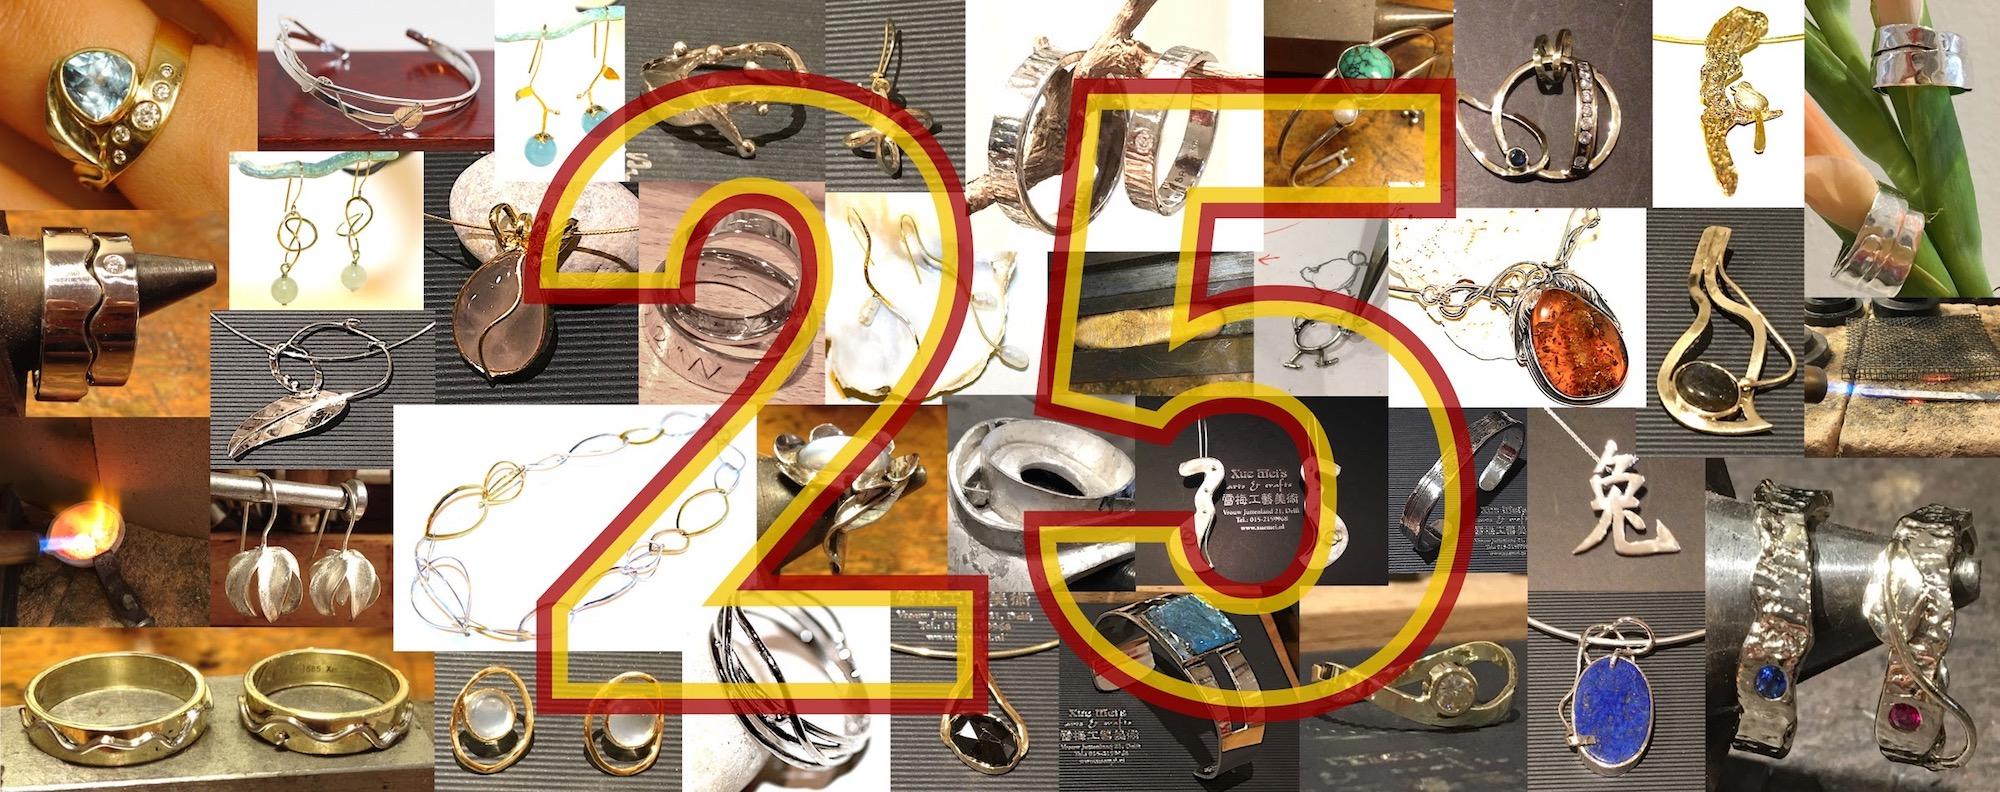 Uitnodiging 25 inloop jubileum